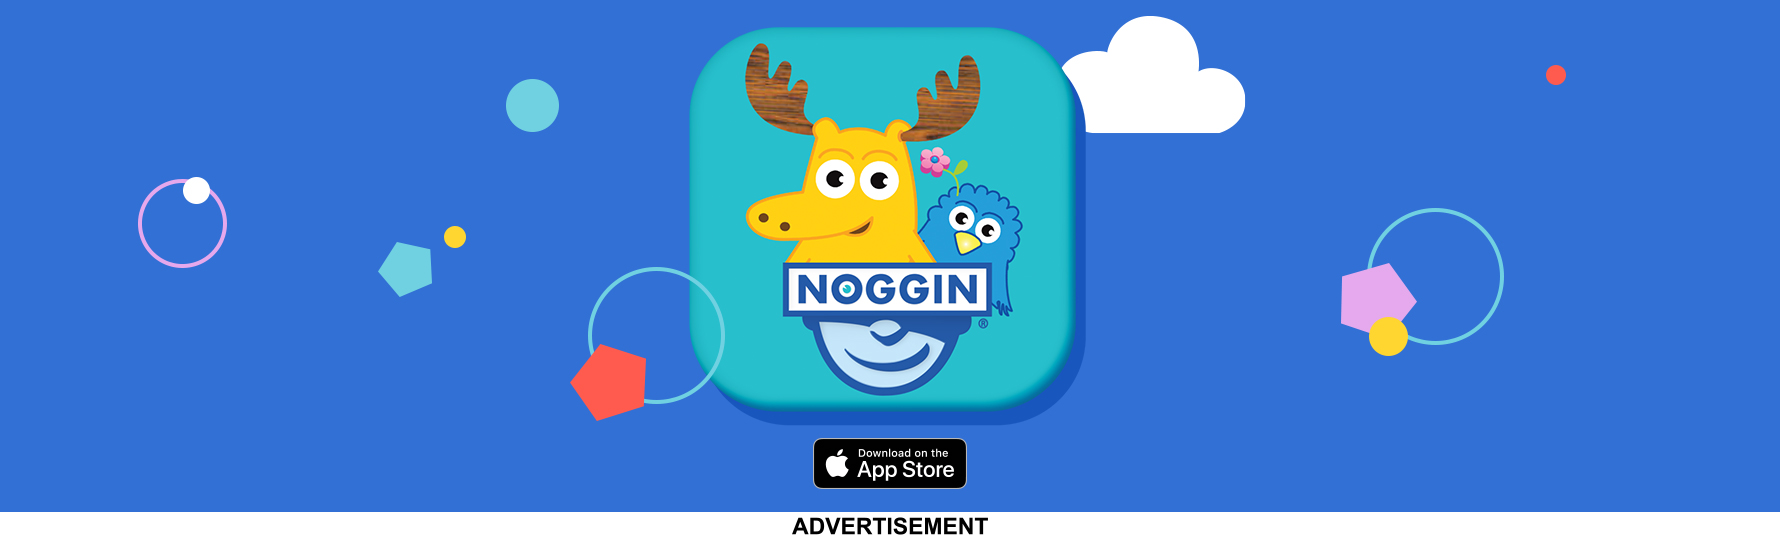 generic-noggin-app-store-2018-promo-xl-3.jpg